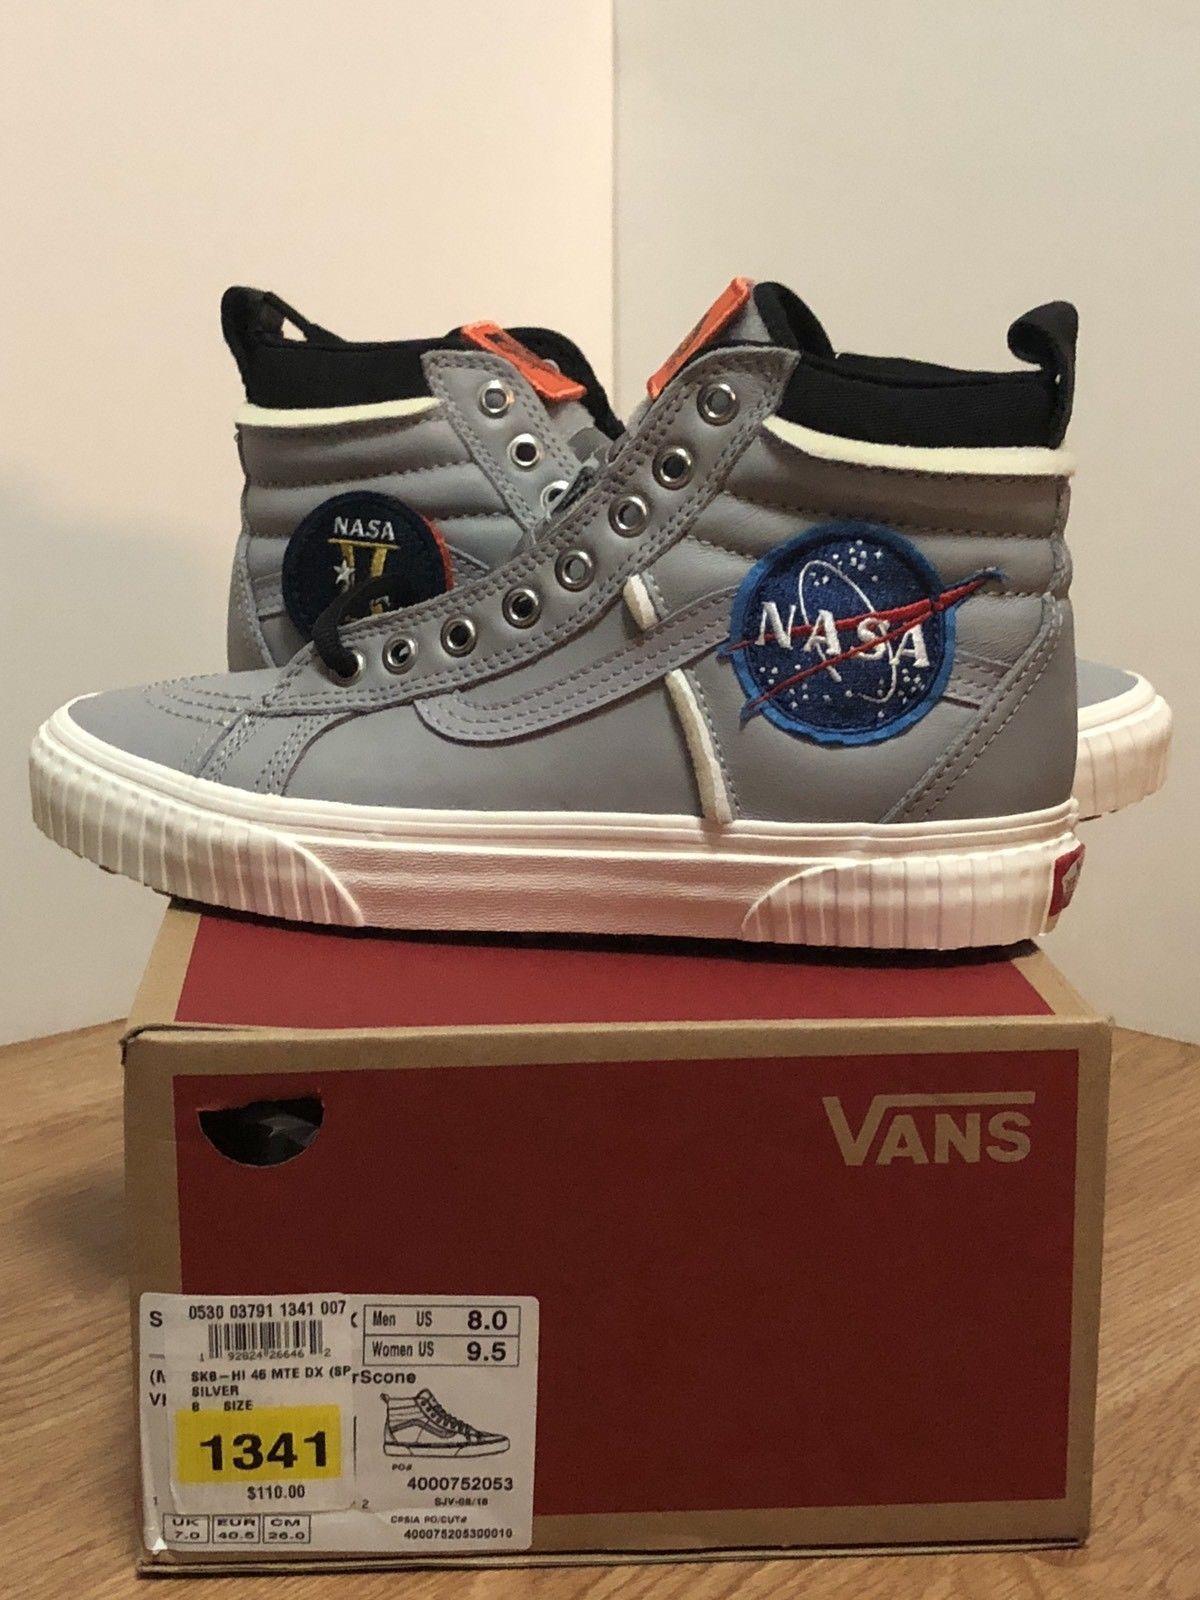 Details about Vans x NASA Space Voyager Old Skool SK8-HI 46 MTE DX ... 66991cdbe